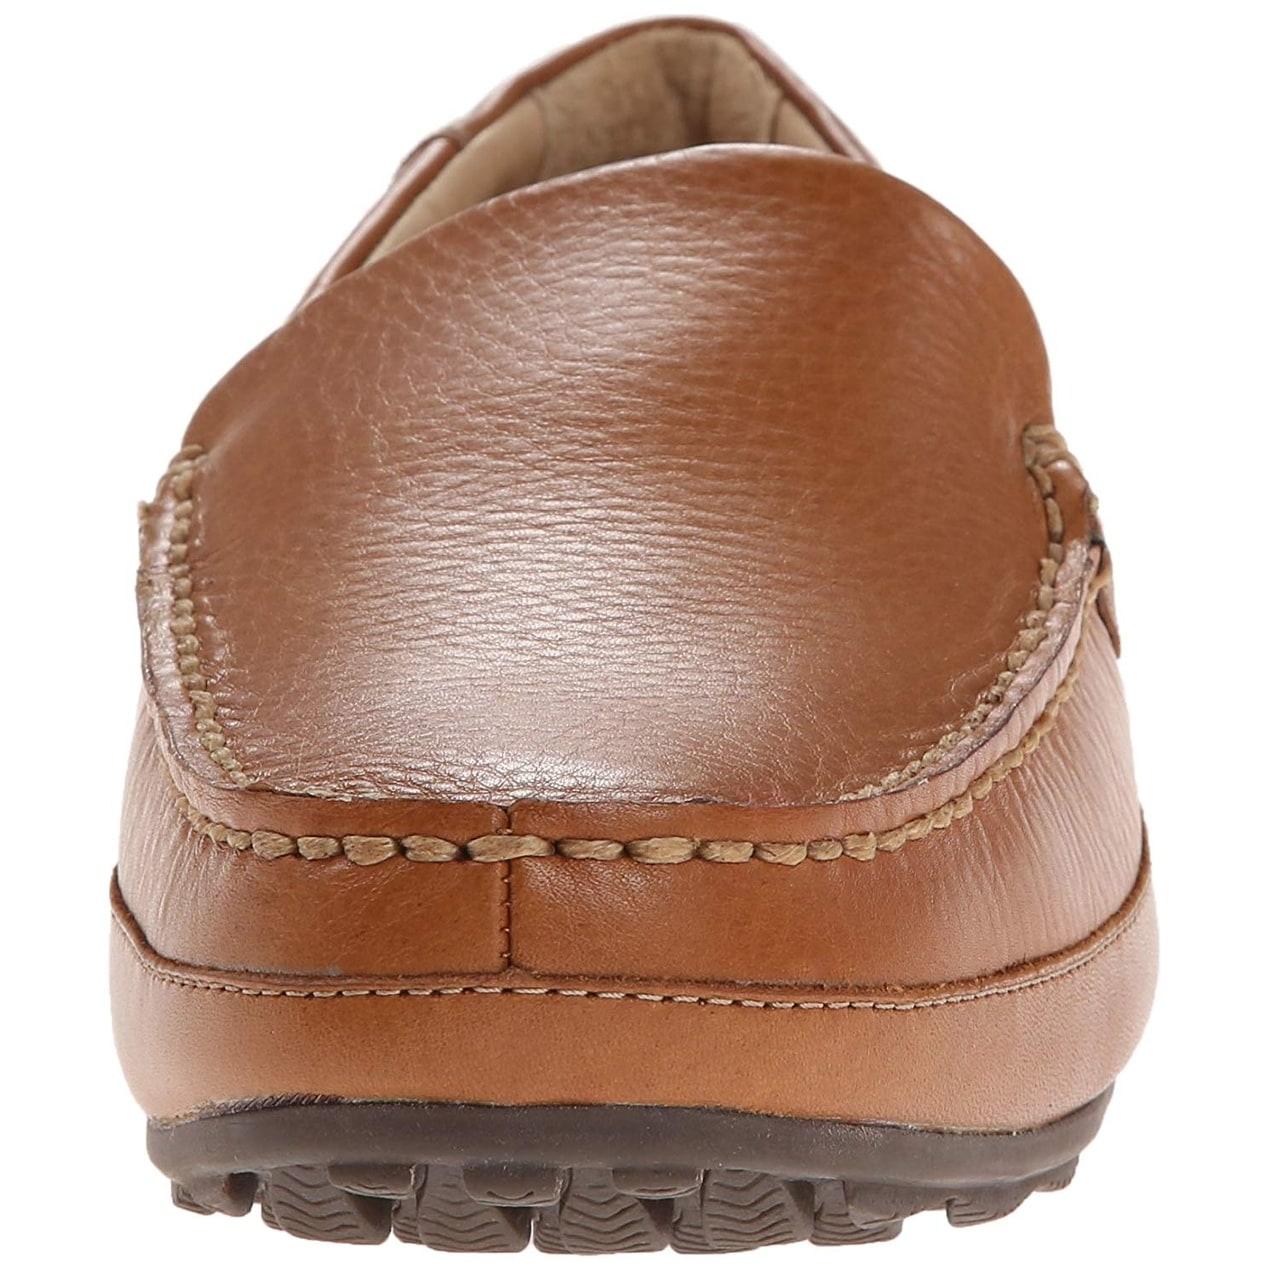 5b52ae39c36 Shop Sperry Men s Hampden Venetian Slip-On Loafer - 10 - Free Shipping  Today - Overstock - 27704323